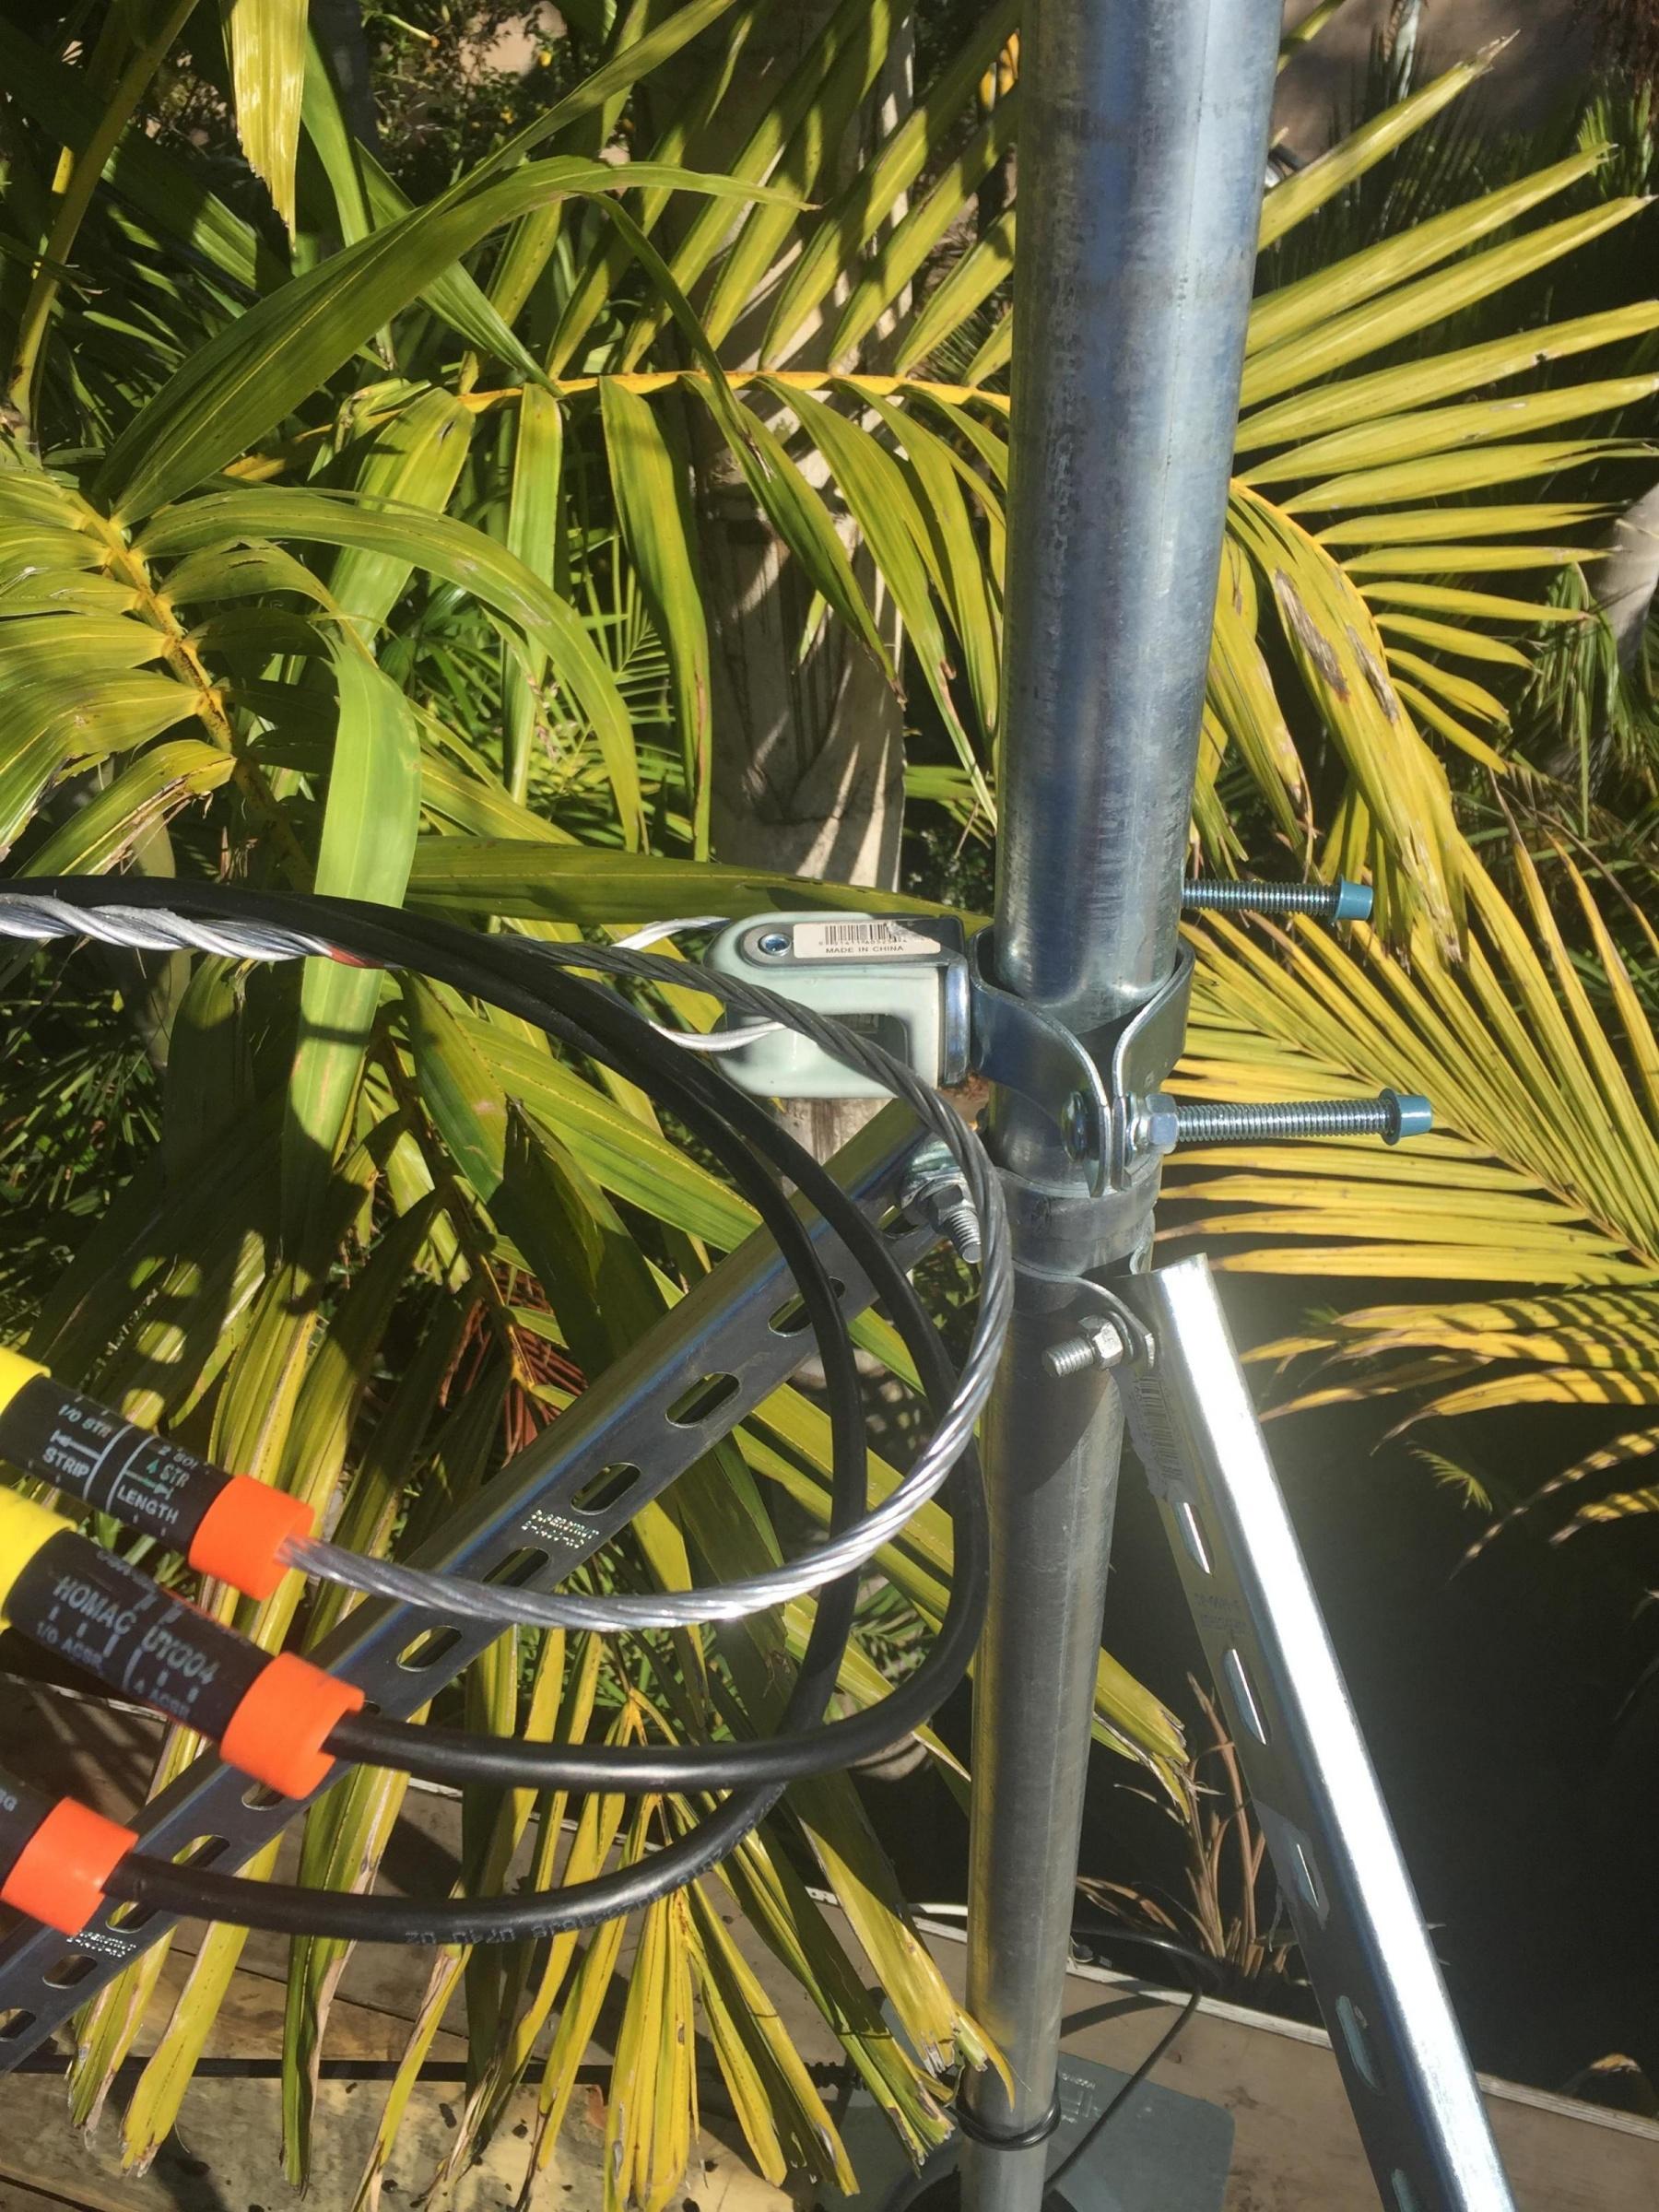 Palm falls down power goes off then on again-9cc6a89a-0113-4f1b-800e-5212393f84a7_1549677291972.jpg